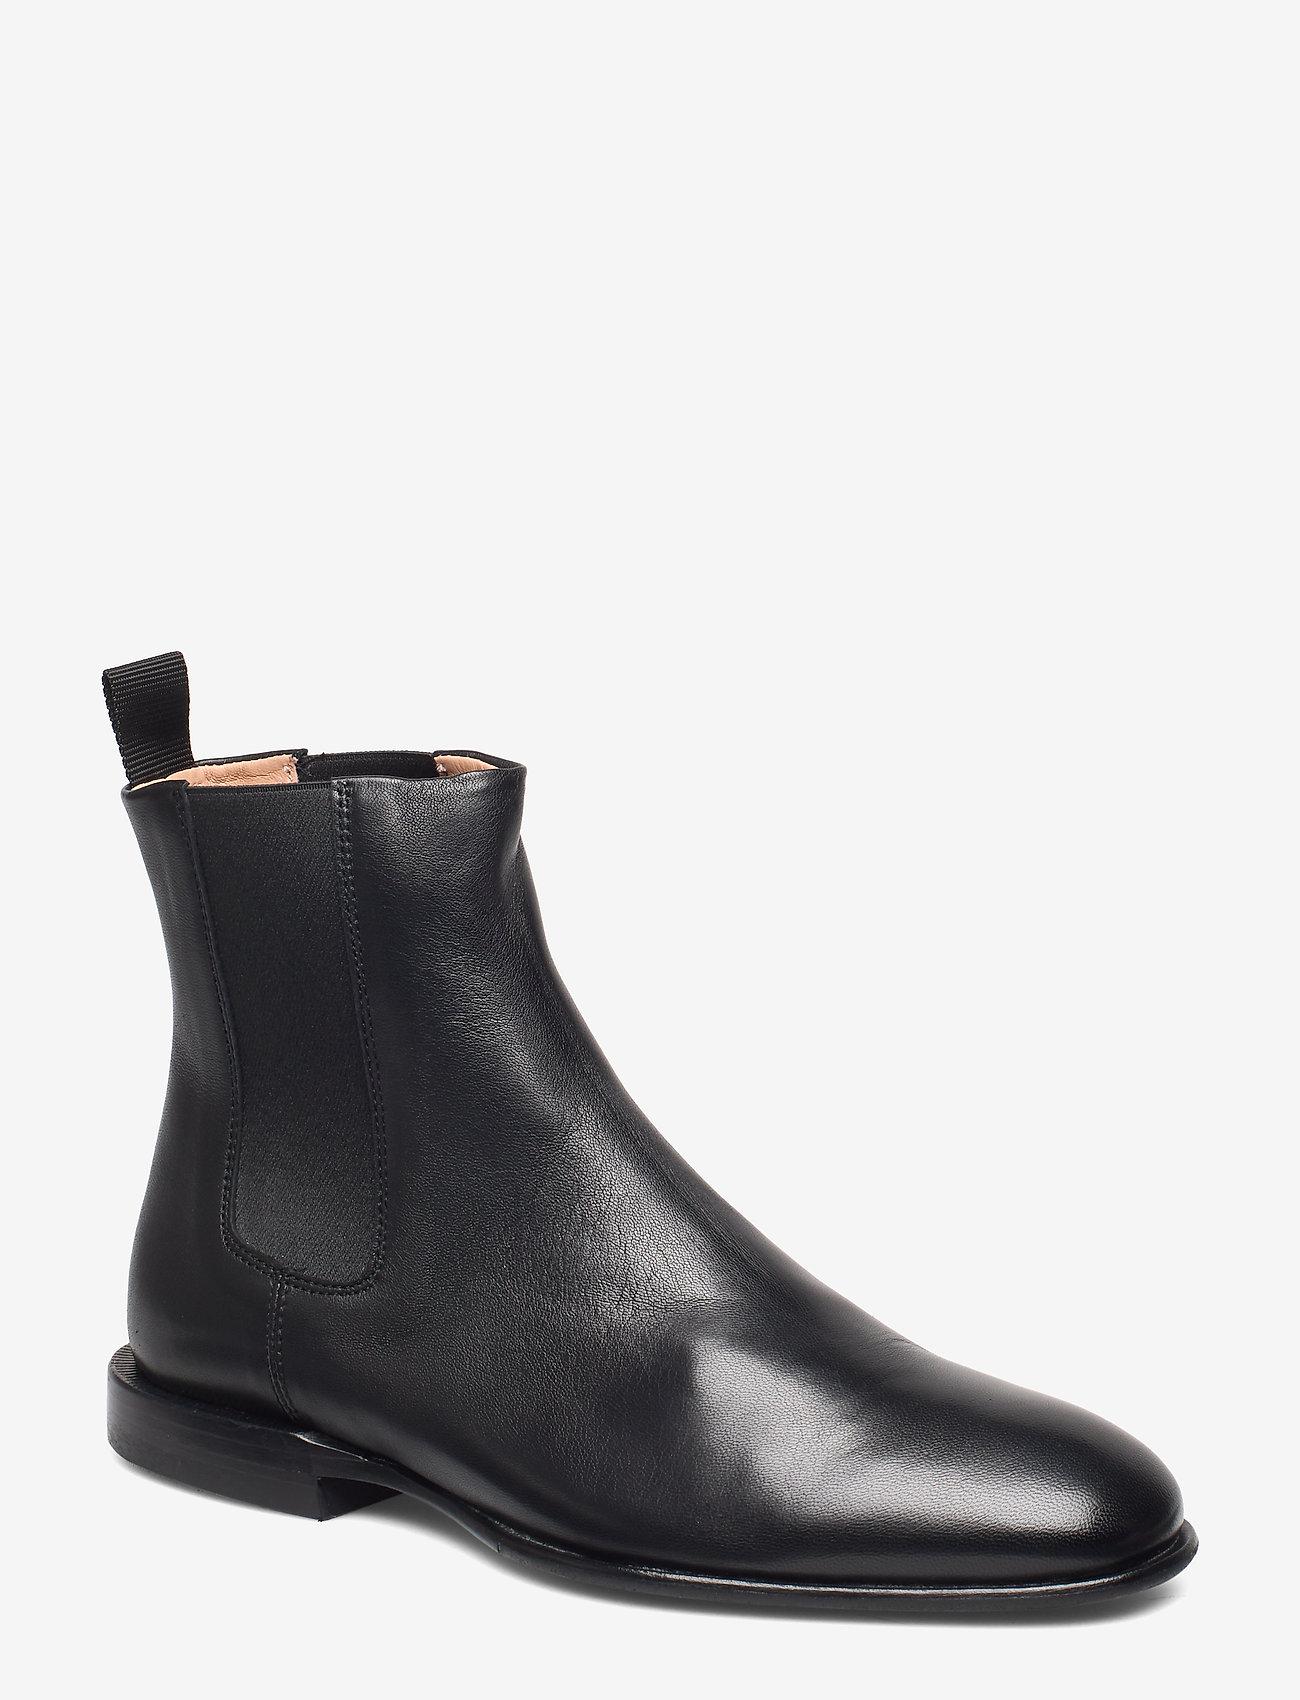 Fallon Low Chelsea Boot